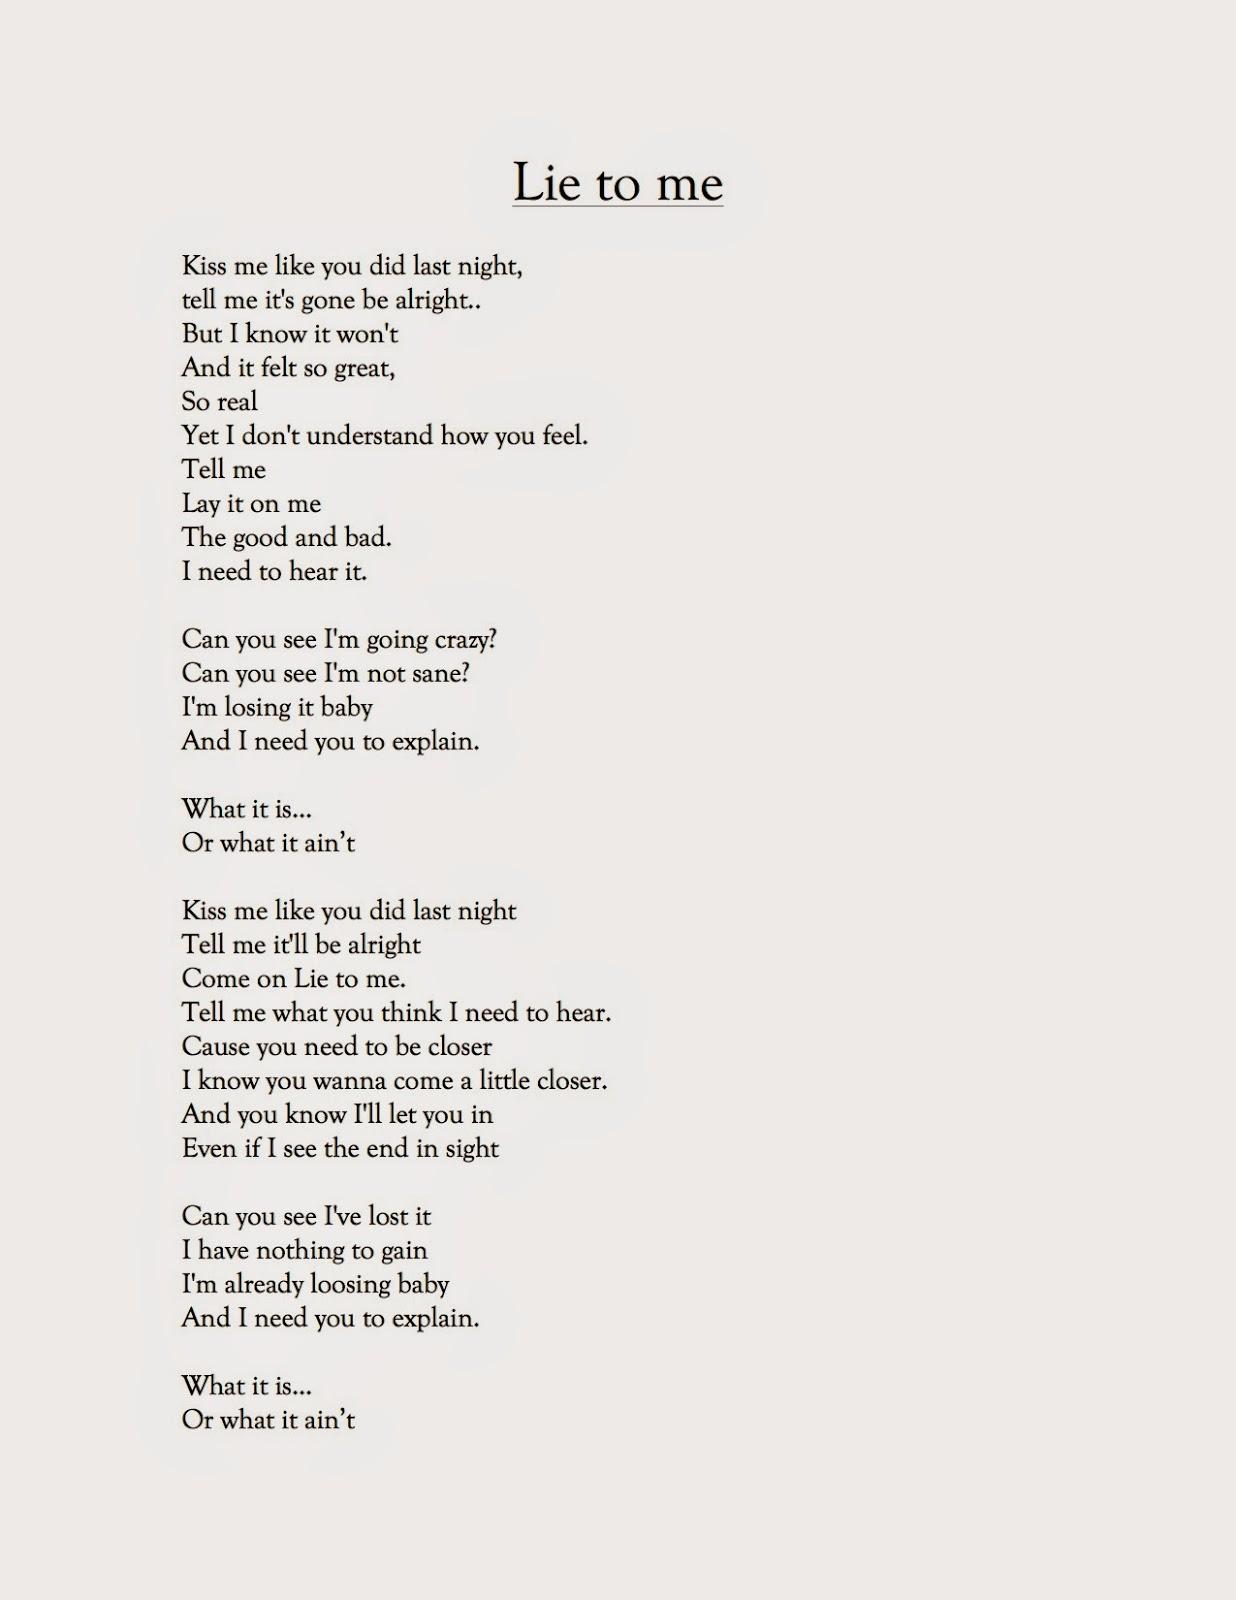 Lie to me lyrics